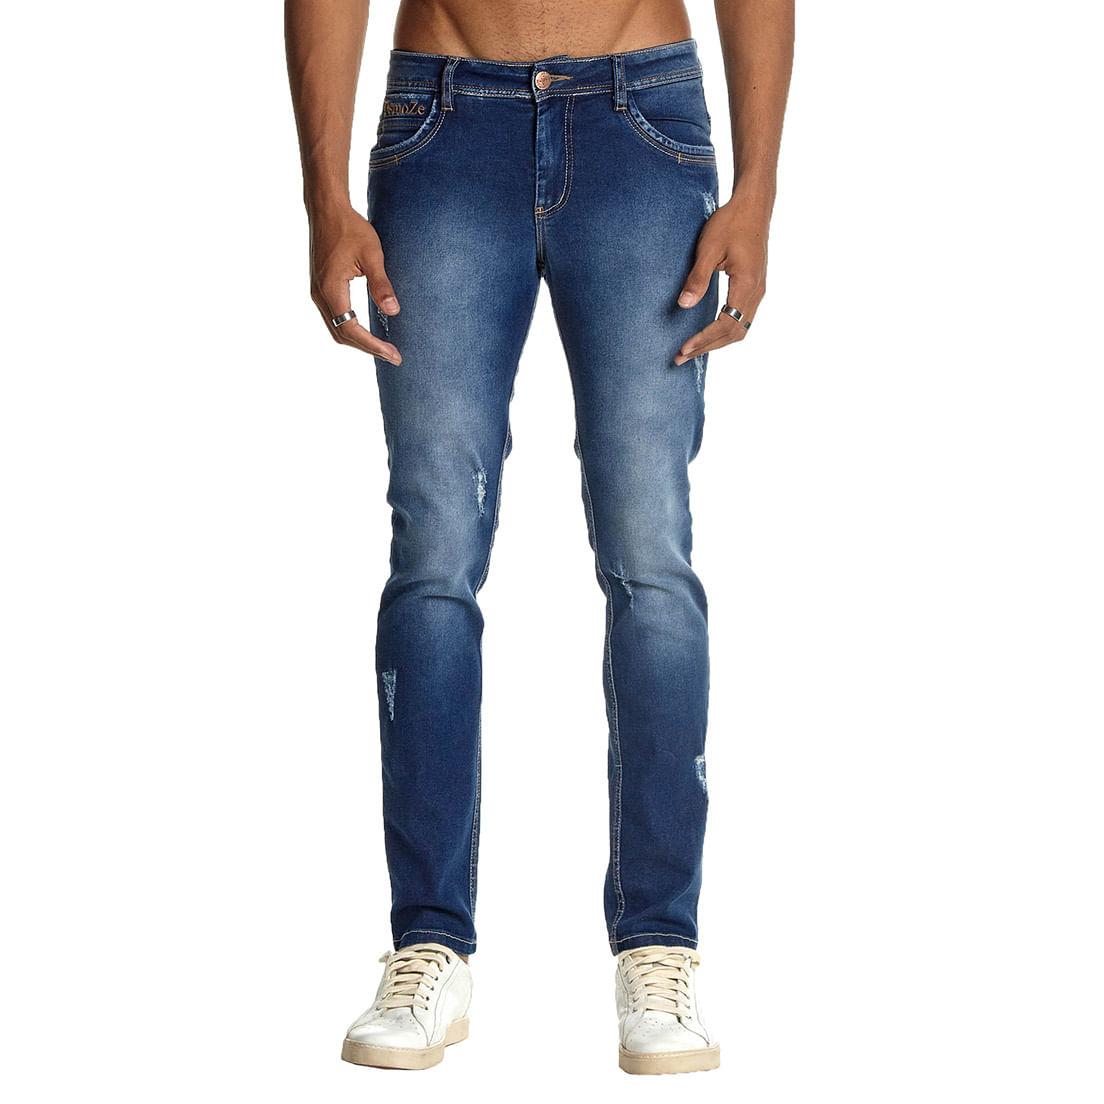 Calça Jeans Osmoze Skinny 101124307 Azul